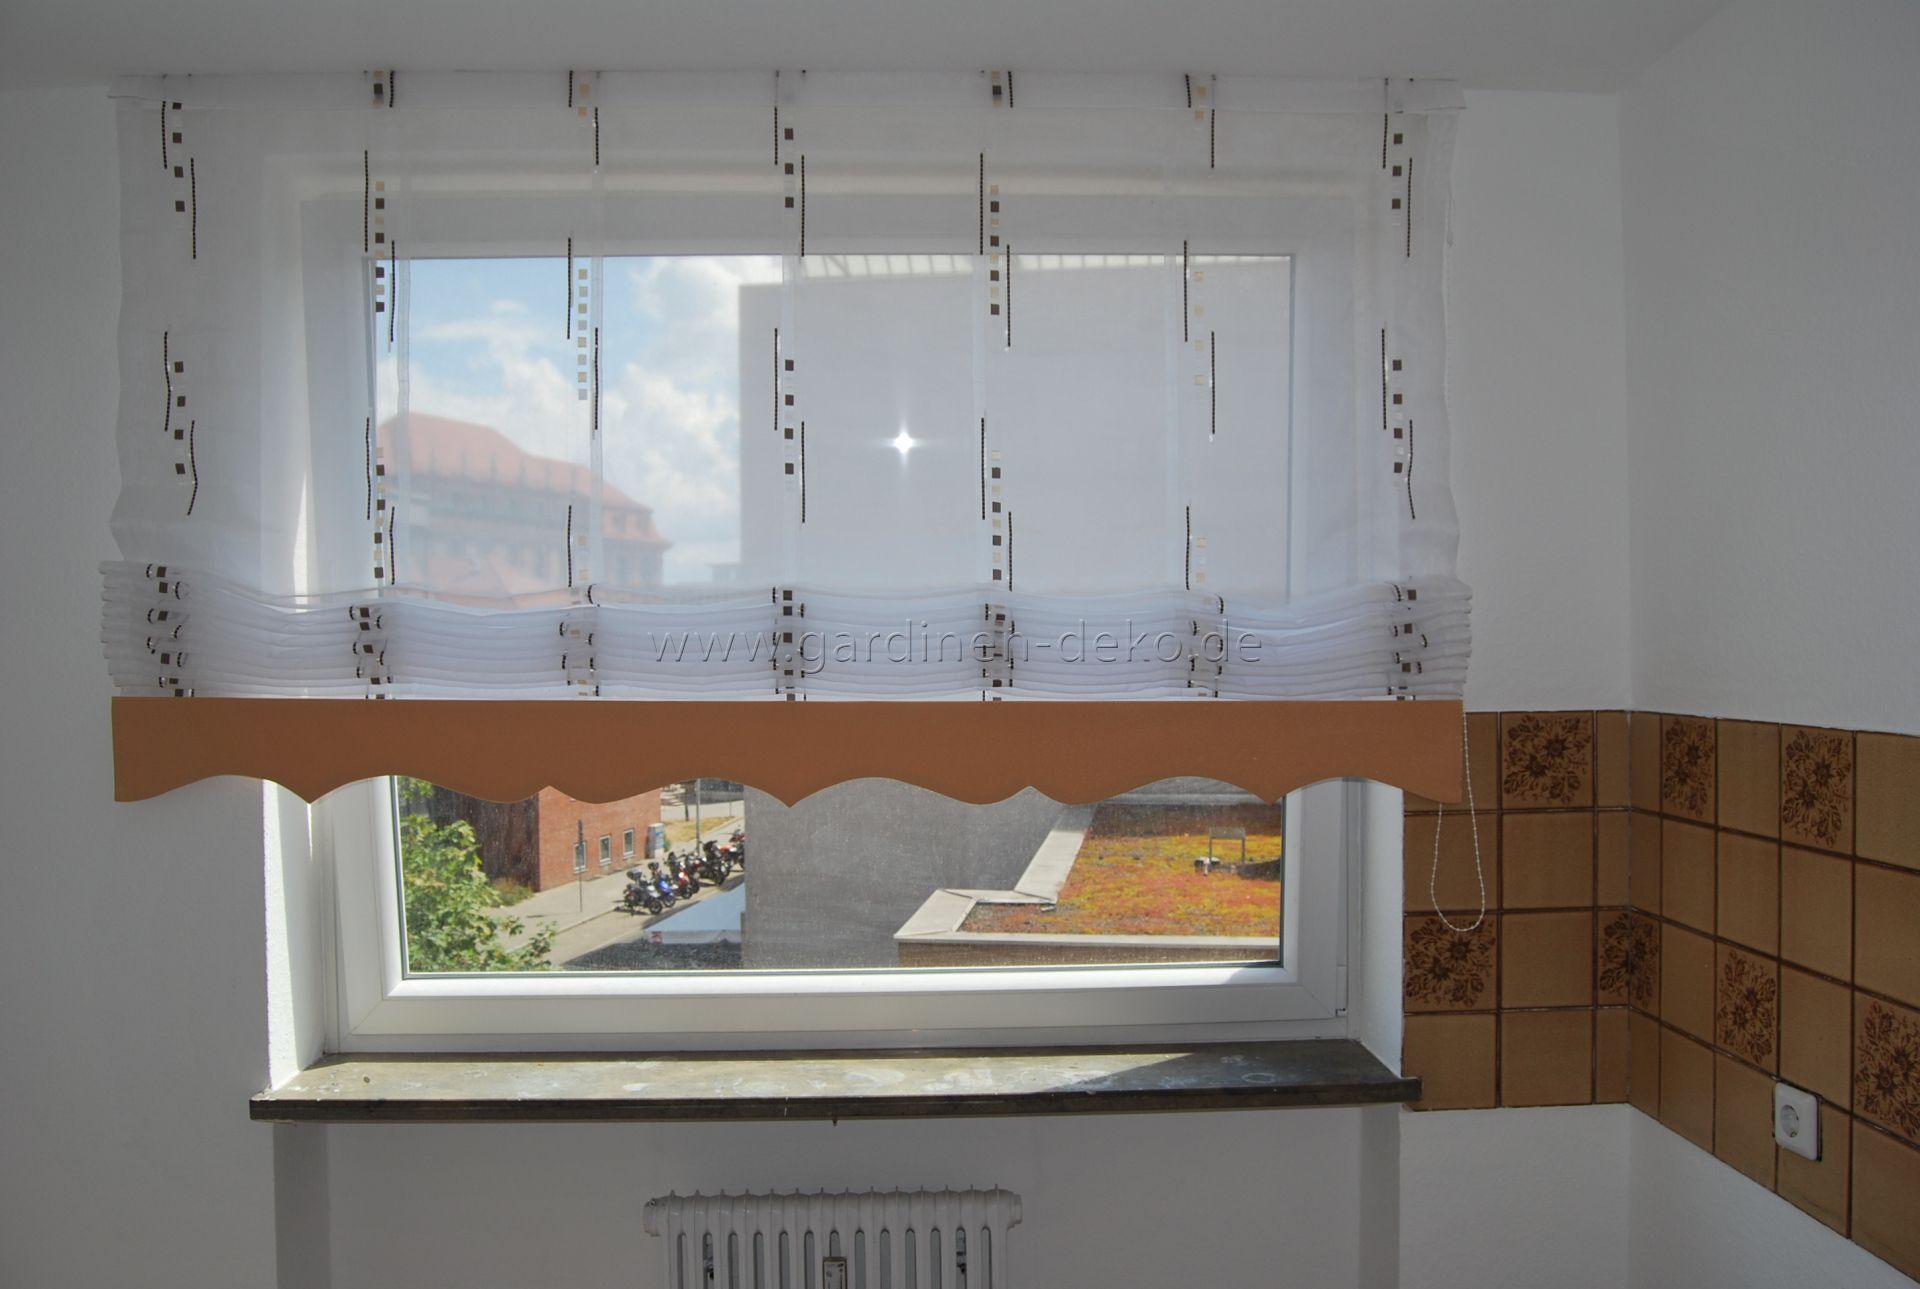 Full Size of Gardinen Küchenfenster Wohnzimmer Fenster Scheibengardinen Küche Schlafzimmer Für Die Wohnzimmer Gardinen Küchenfenster